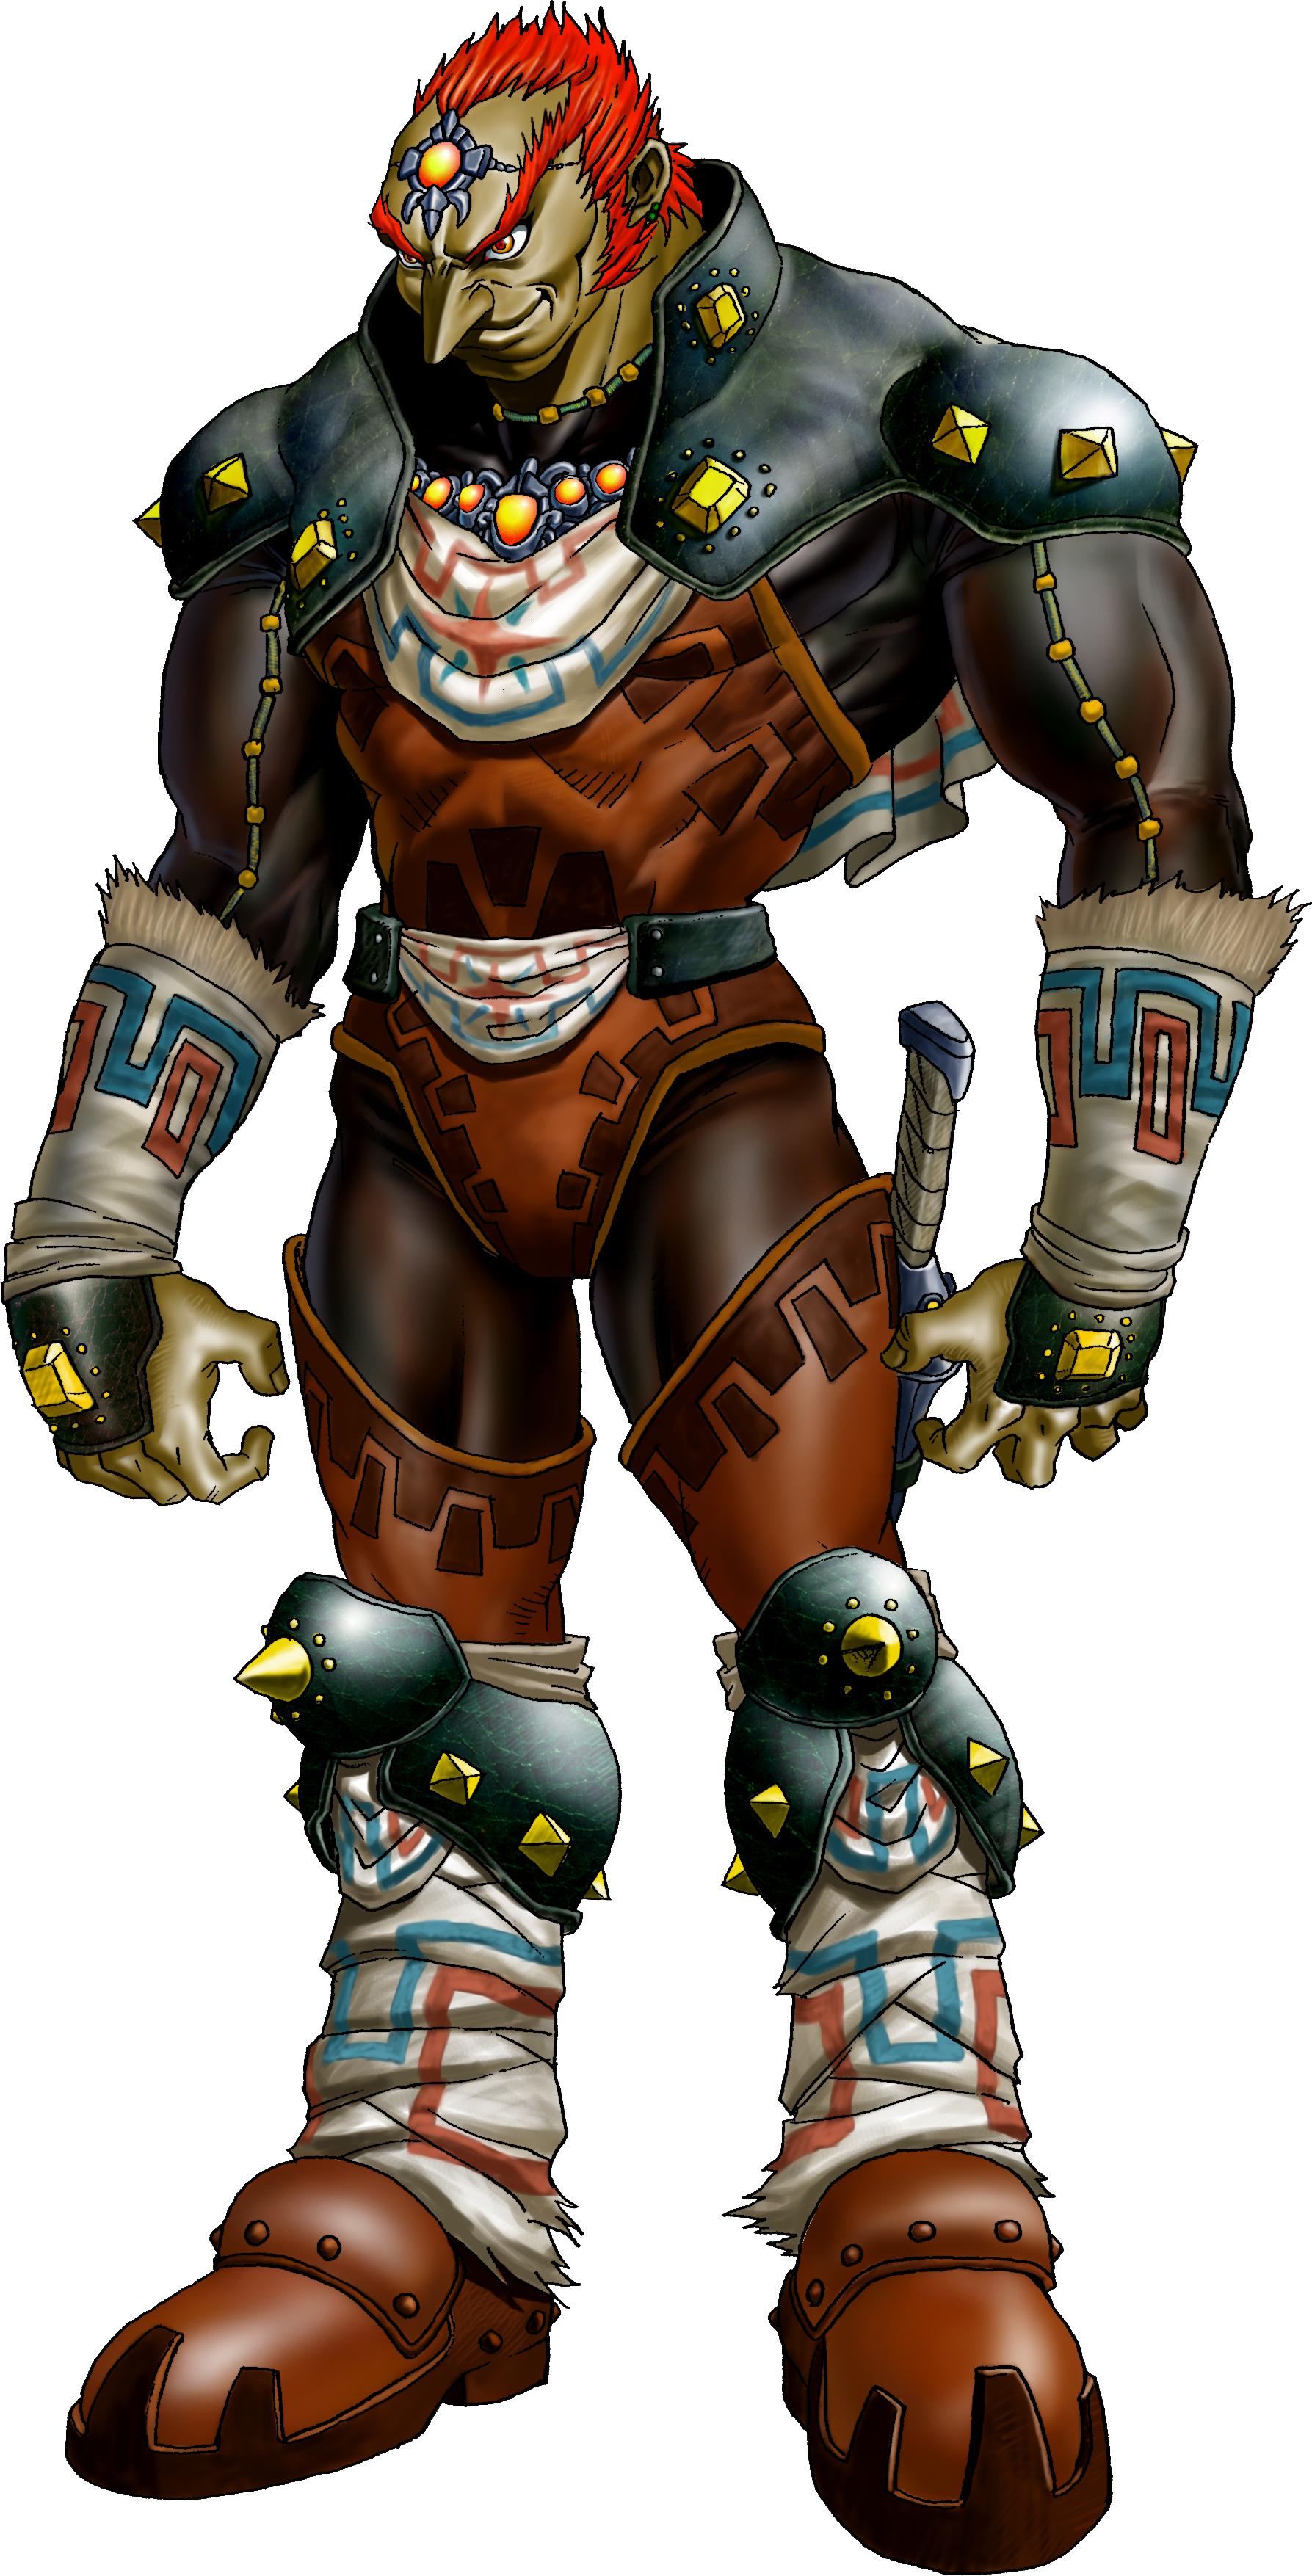 Ganondorf | Wiki Zelda | Fandom